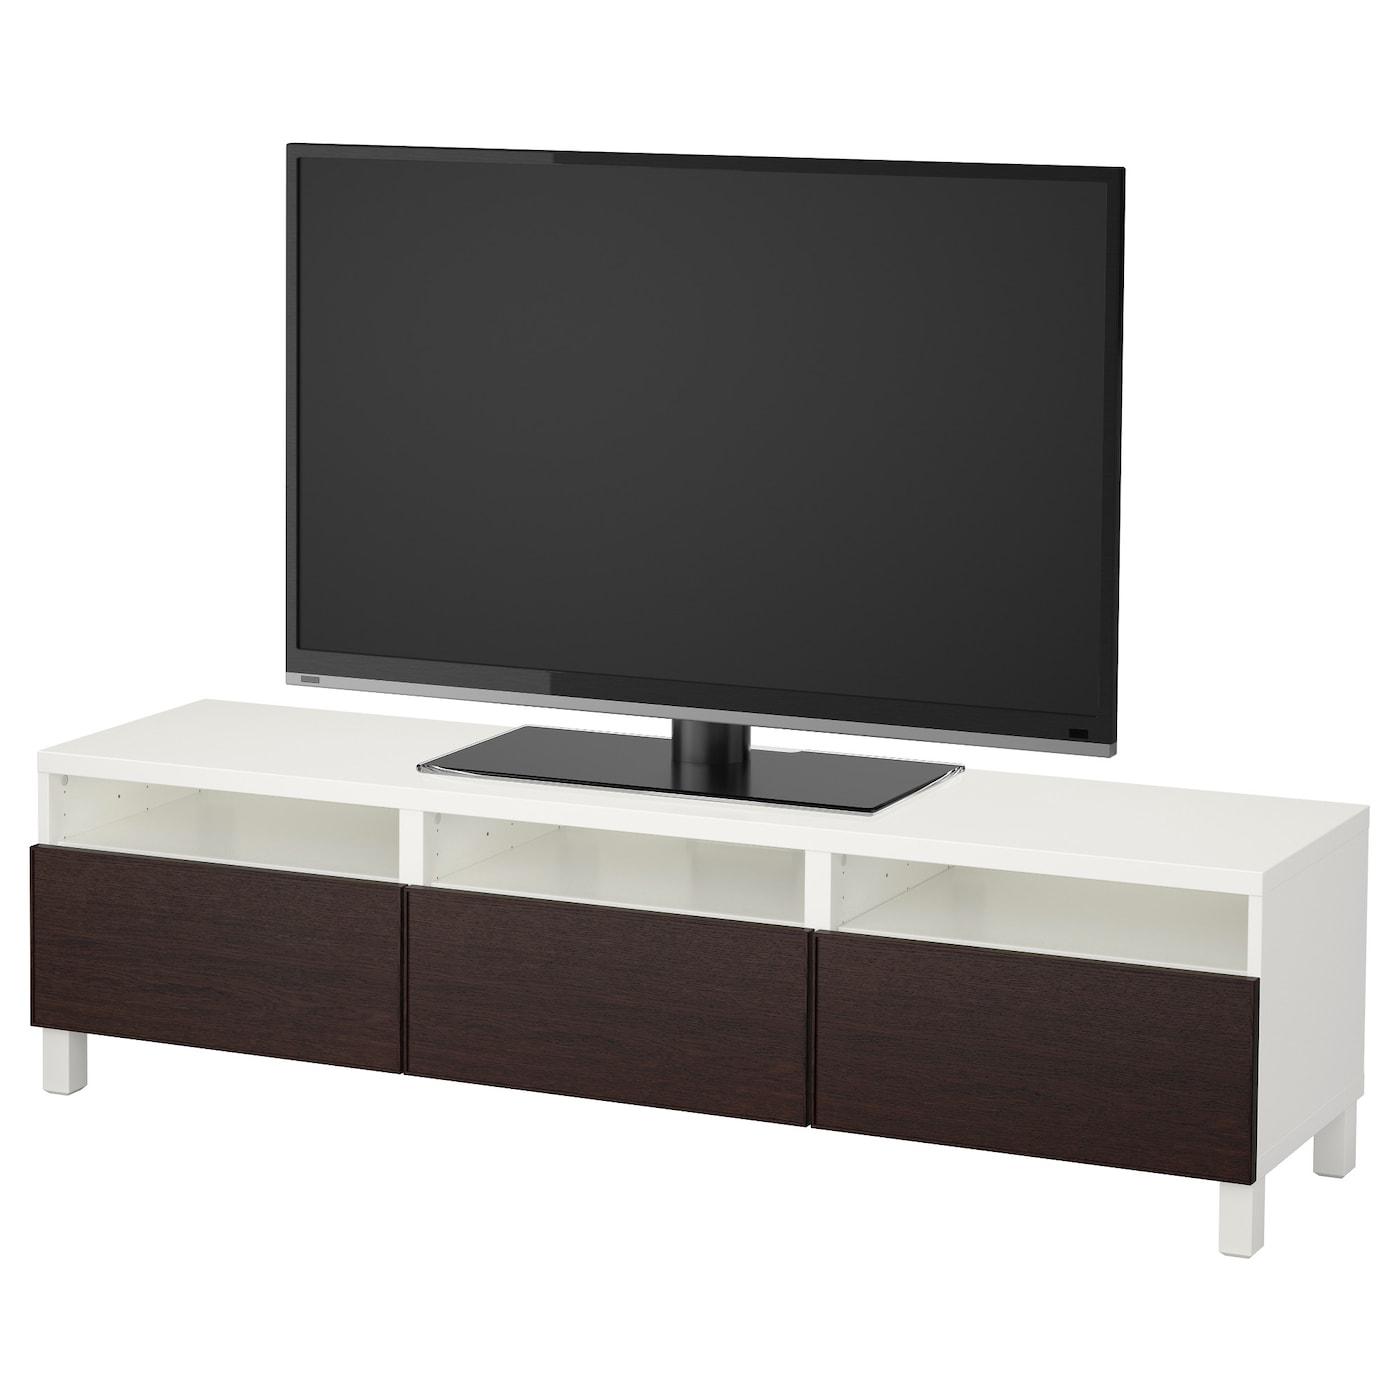 Best Tv Bench With Drawers White Inviken Black Brown 180x40x48 Cm Ikea